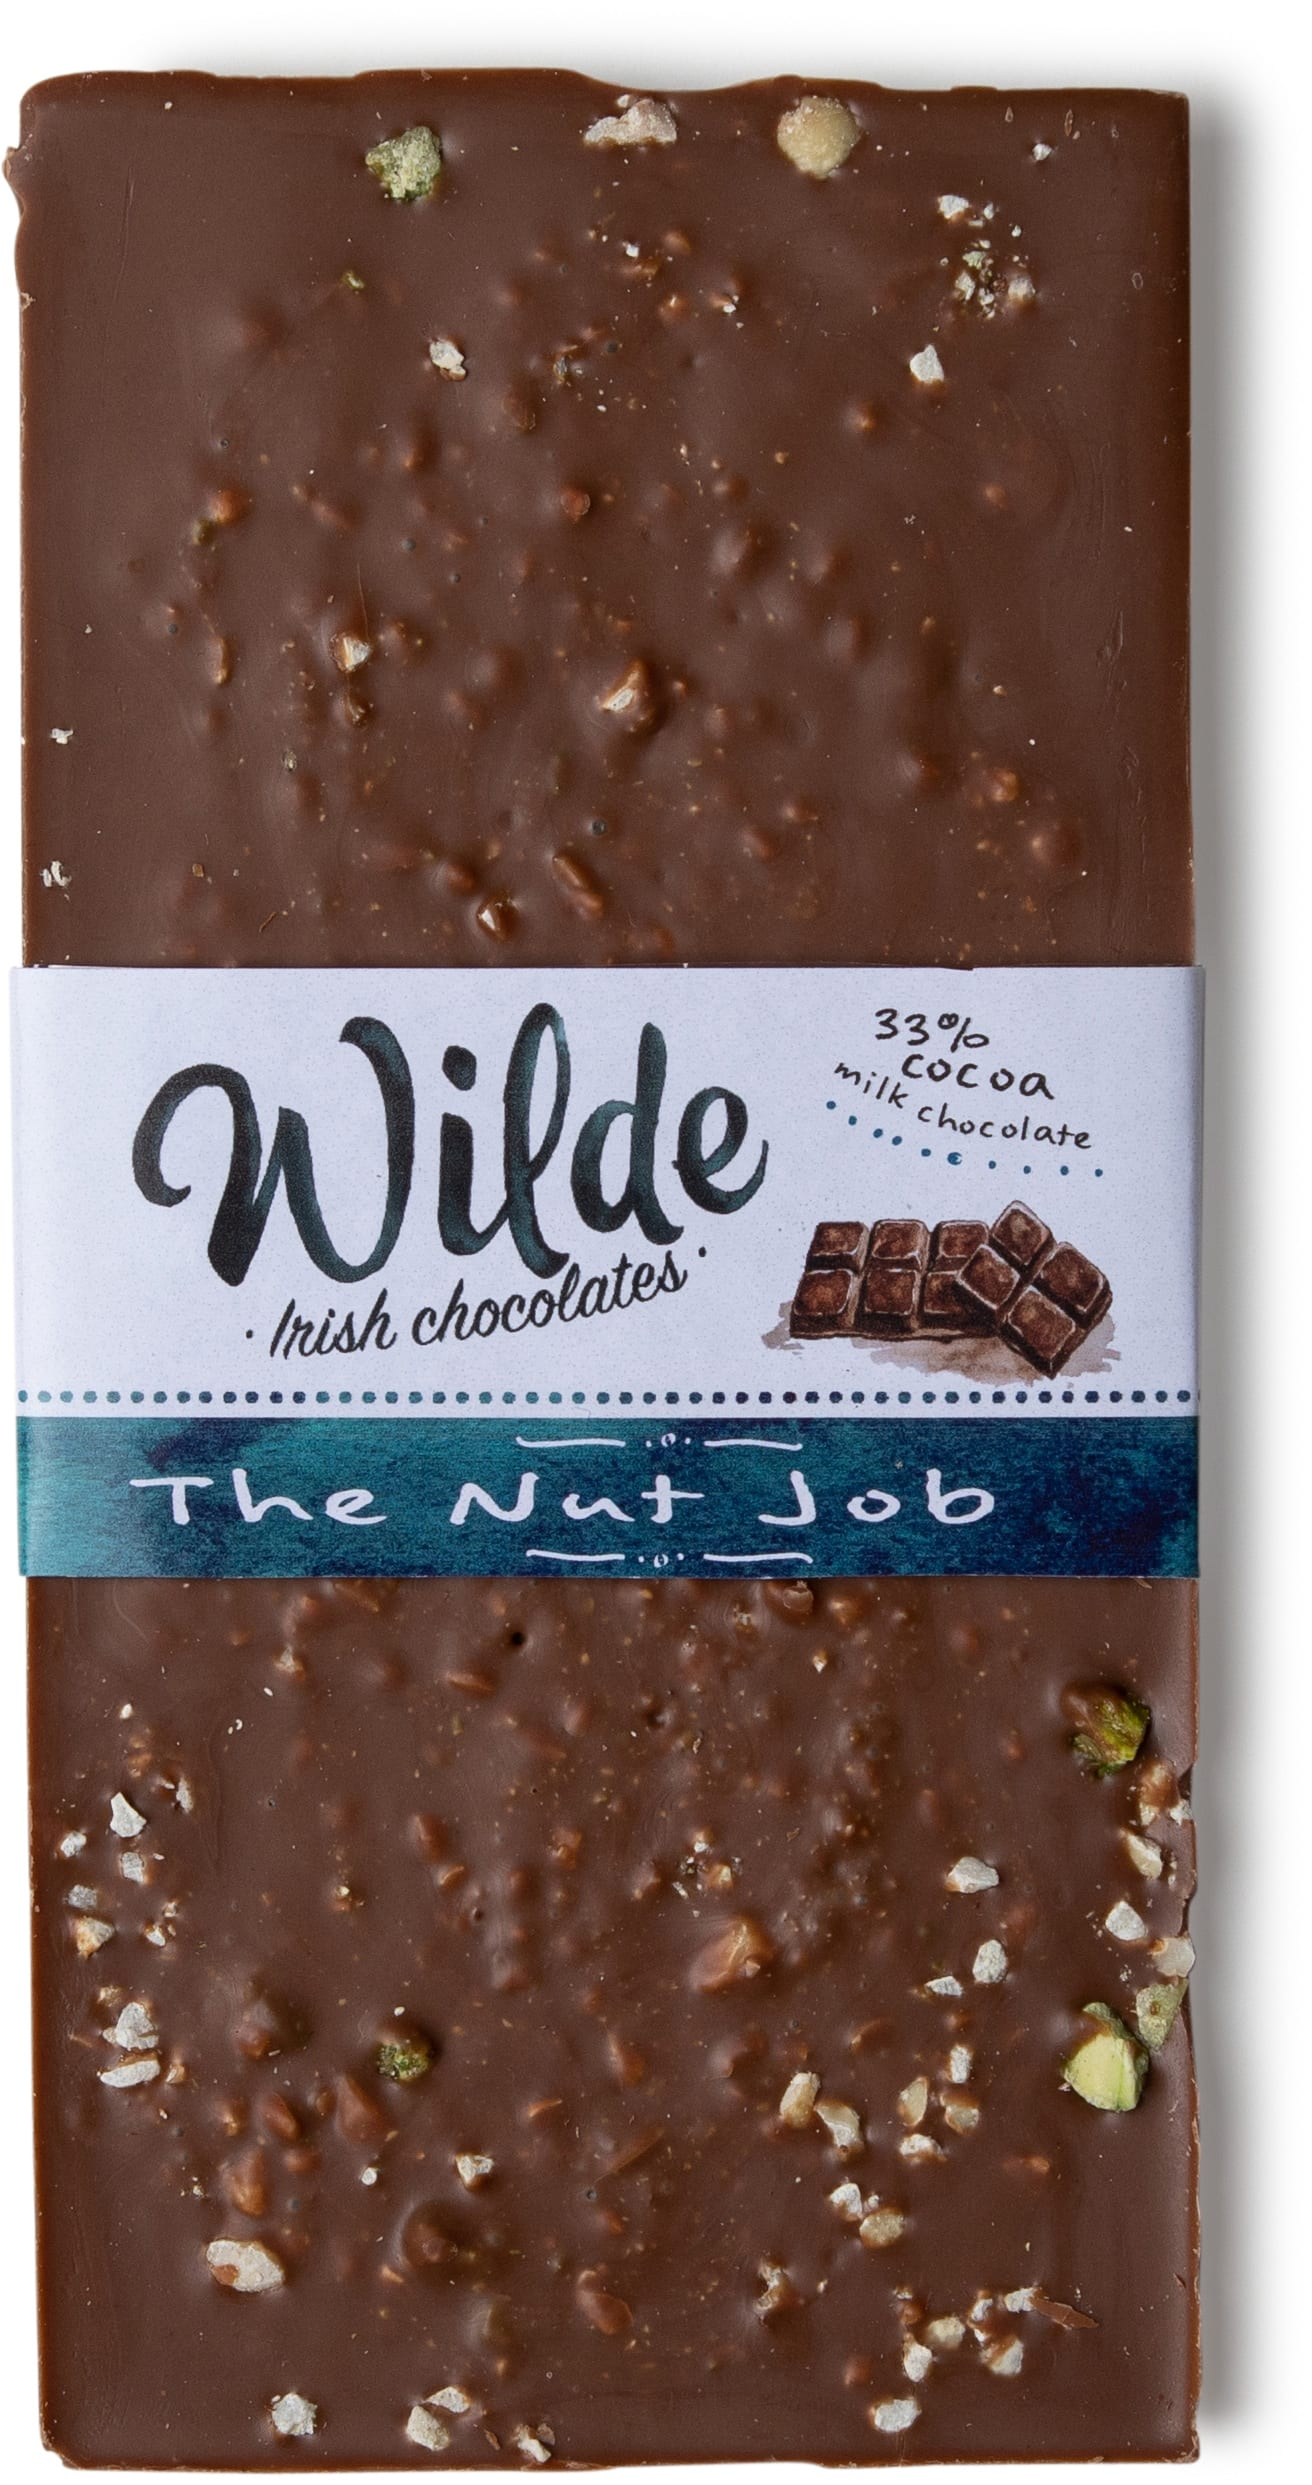 The nut job chocolate bar - Wilde Irish Chocolates